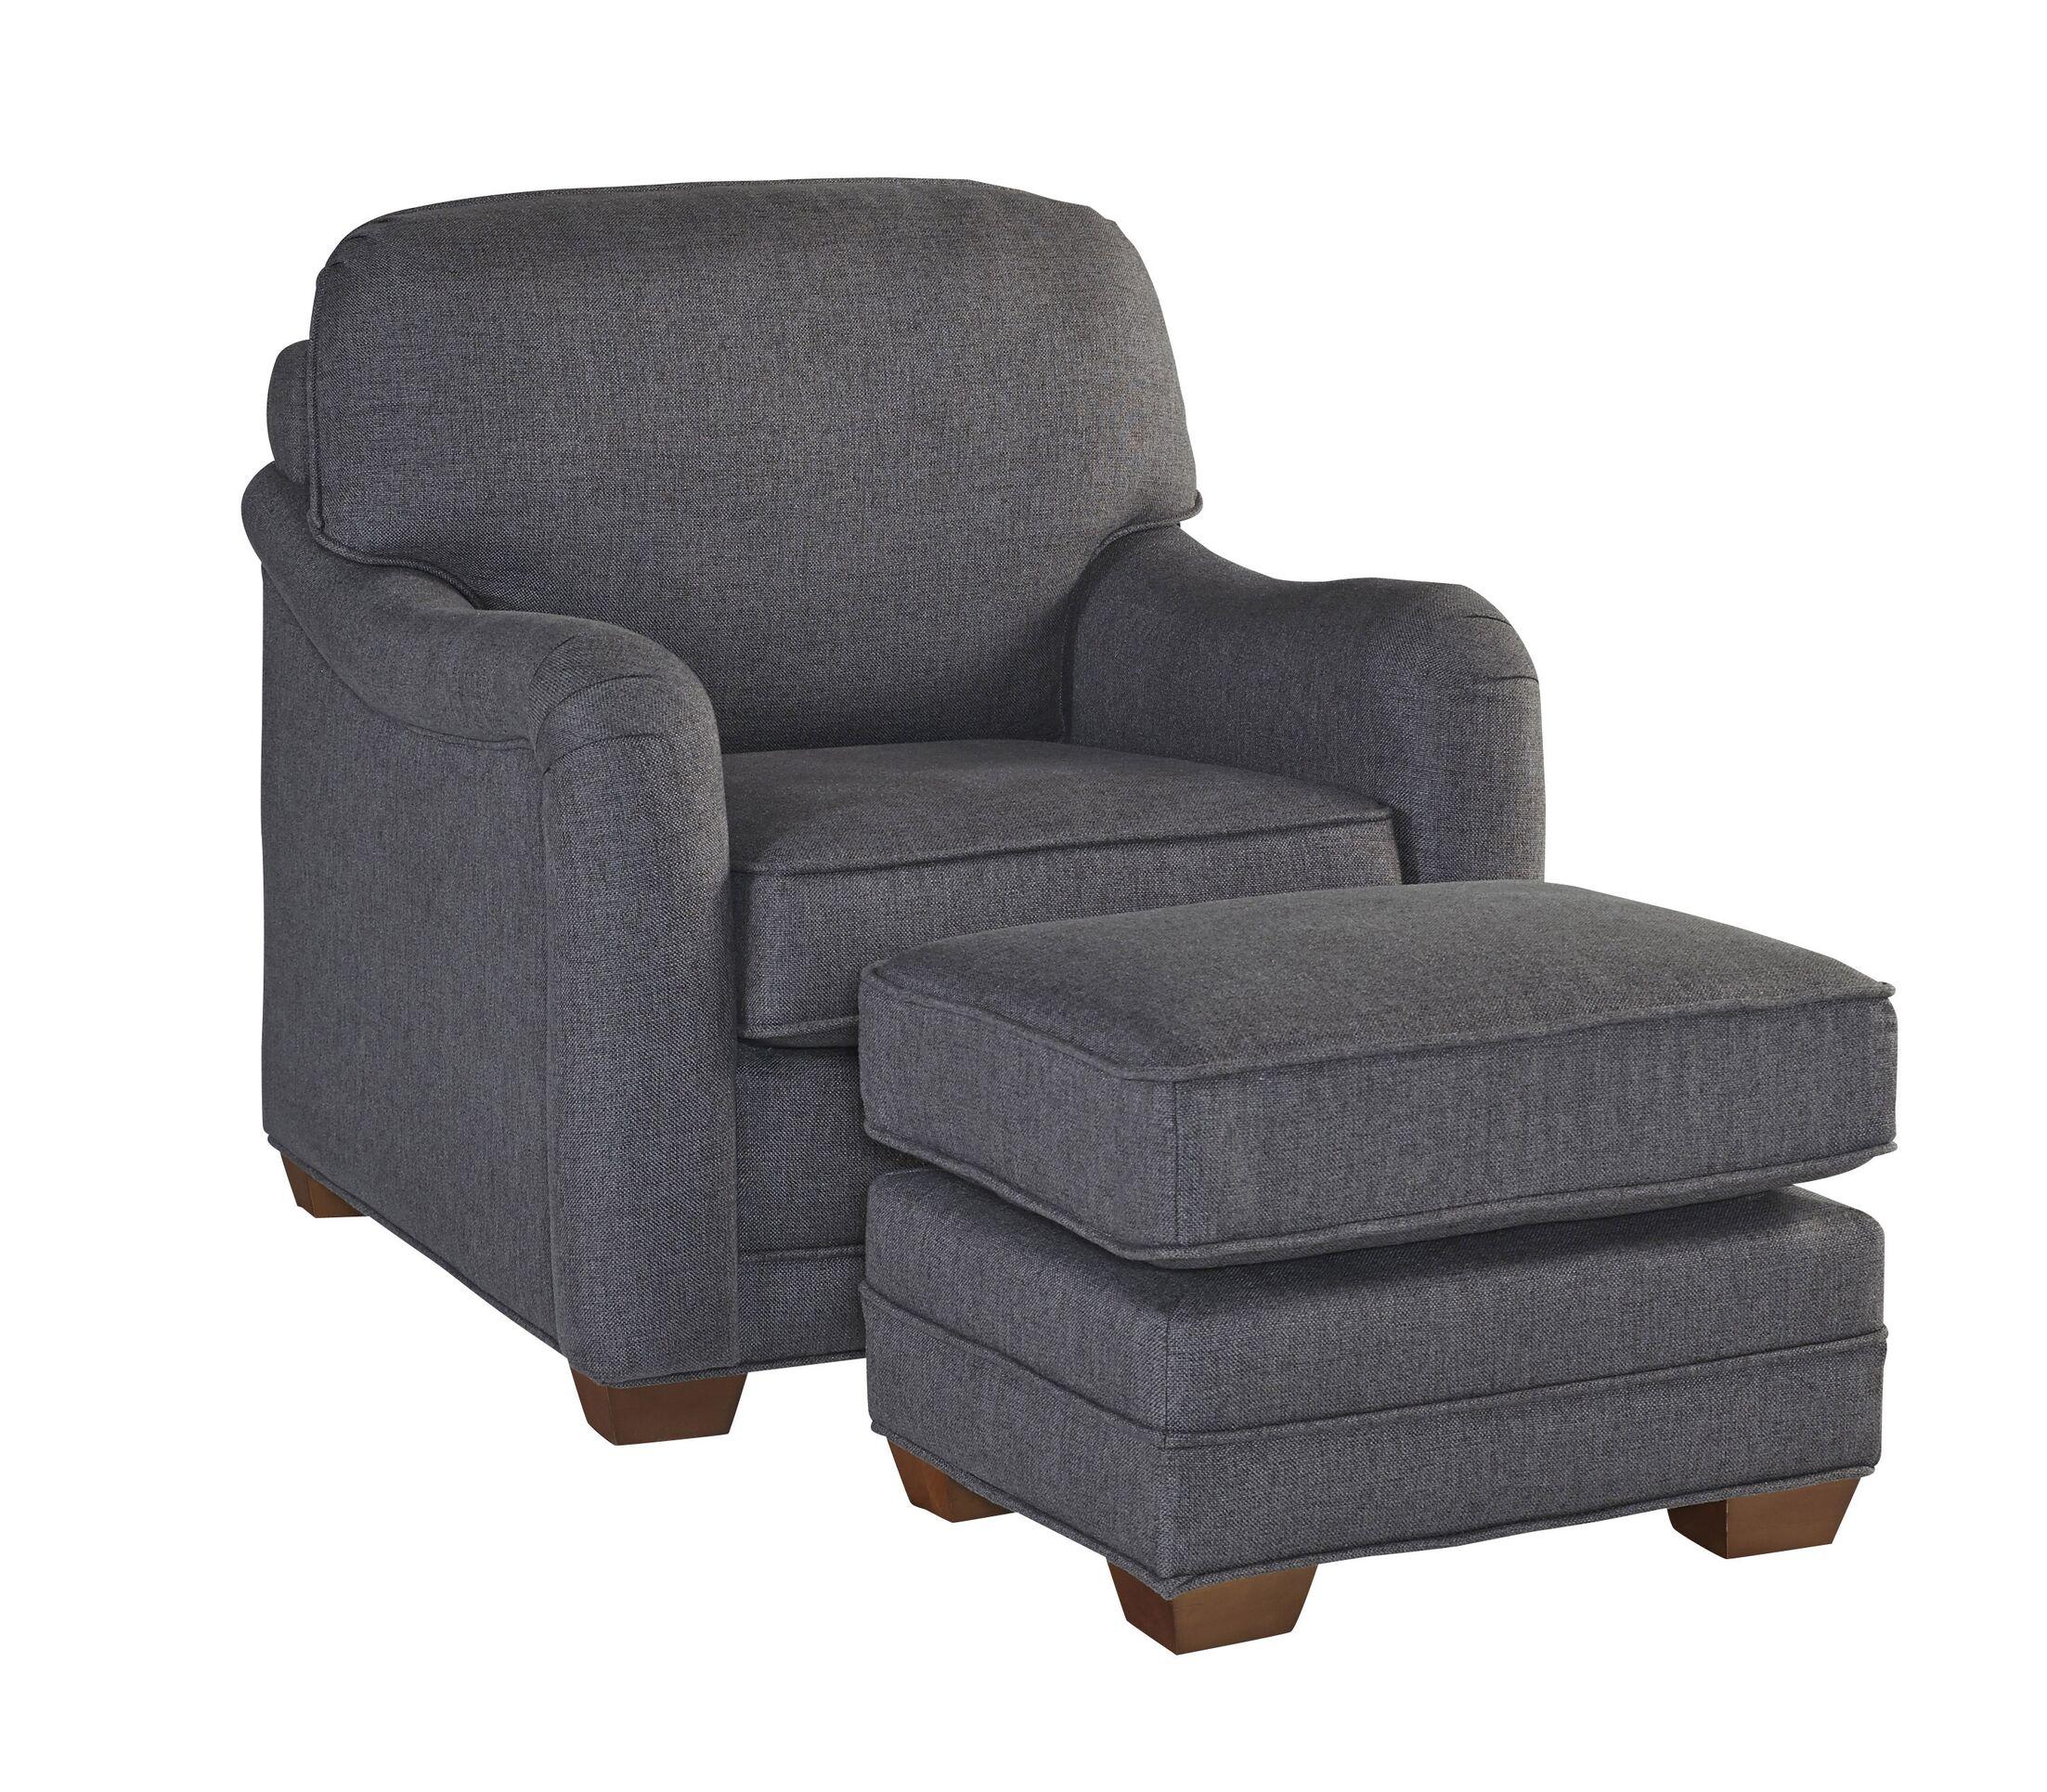 Stationary Armchair and Ottoman Upholstery: Light Gray